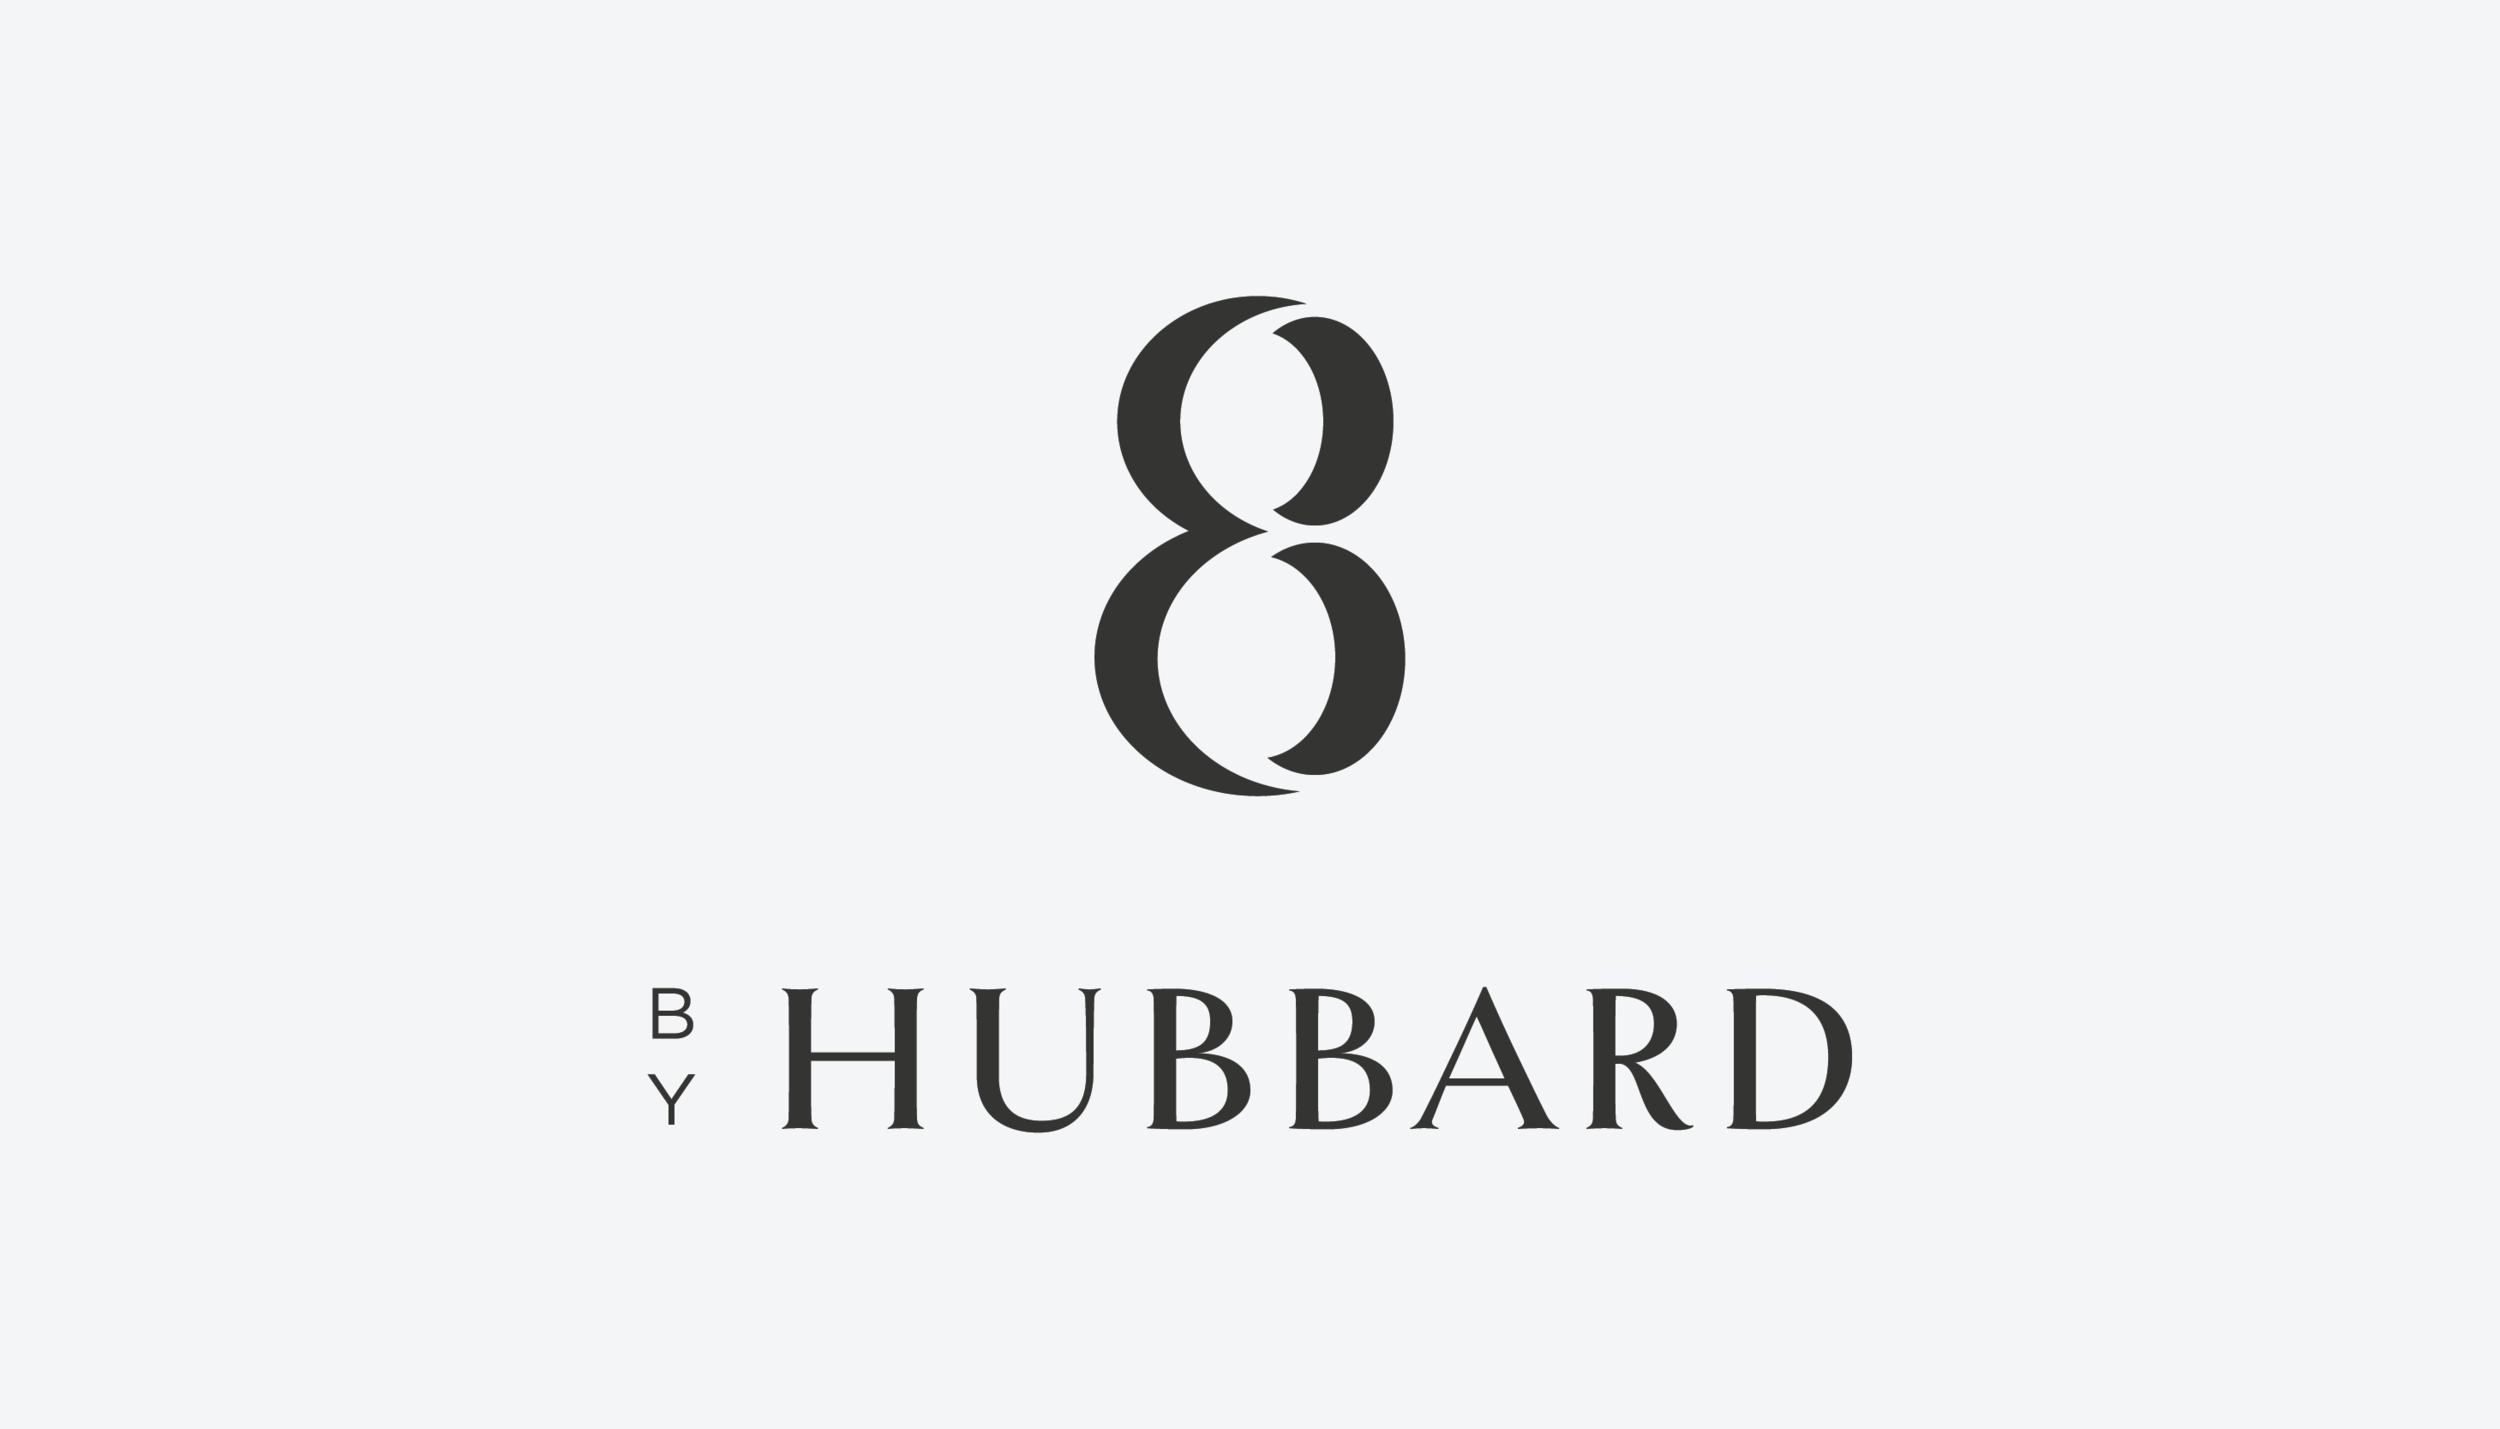 essentials-byhubbard-01.png